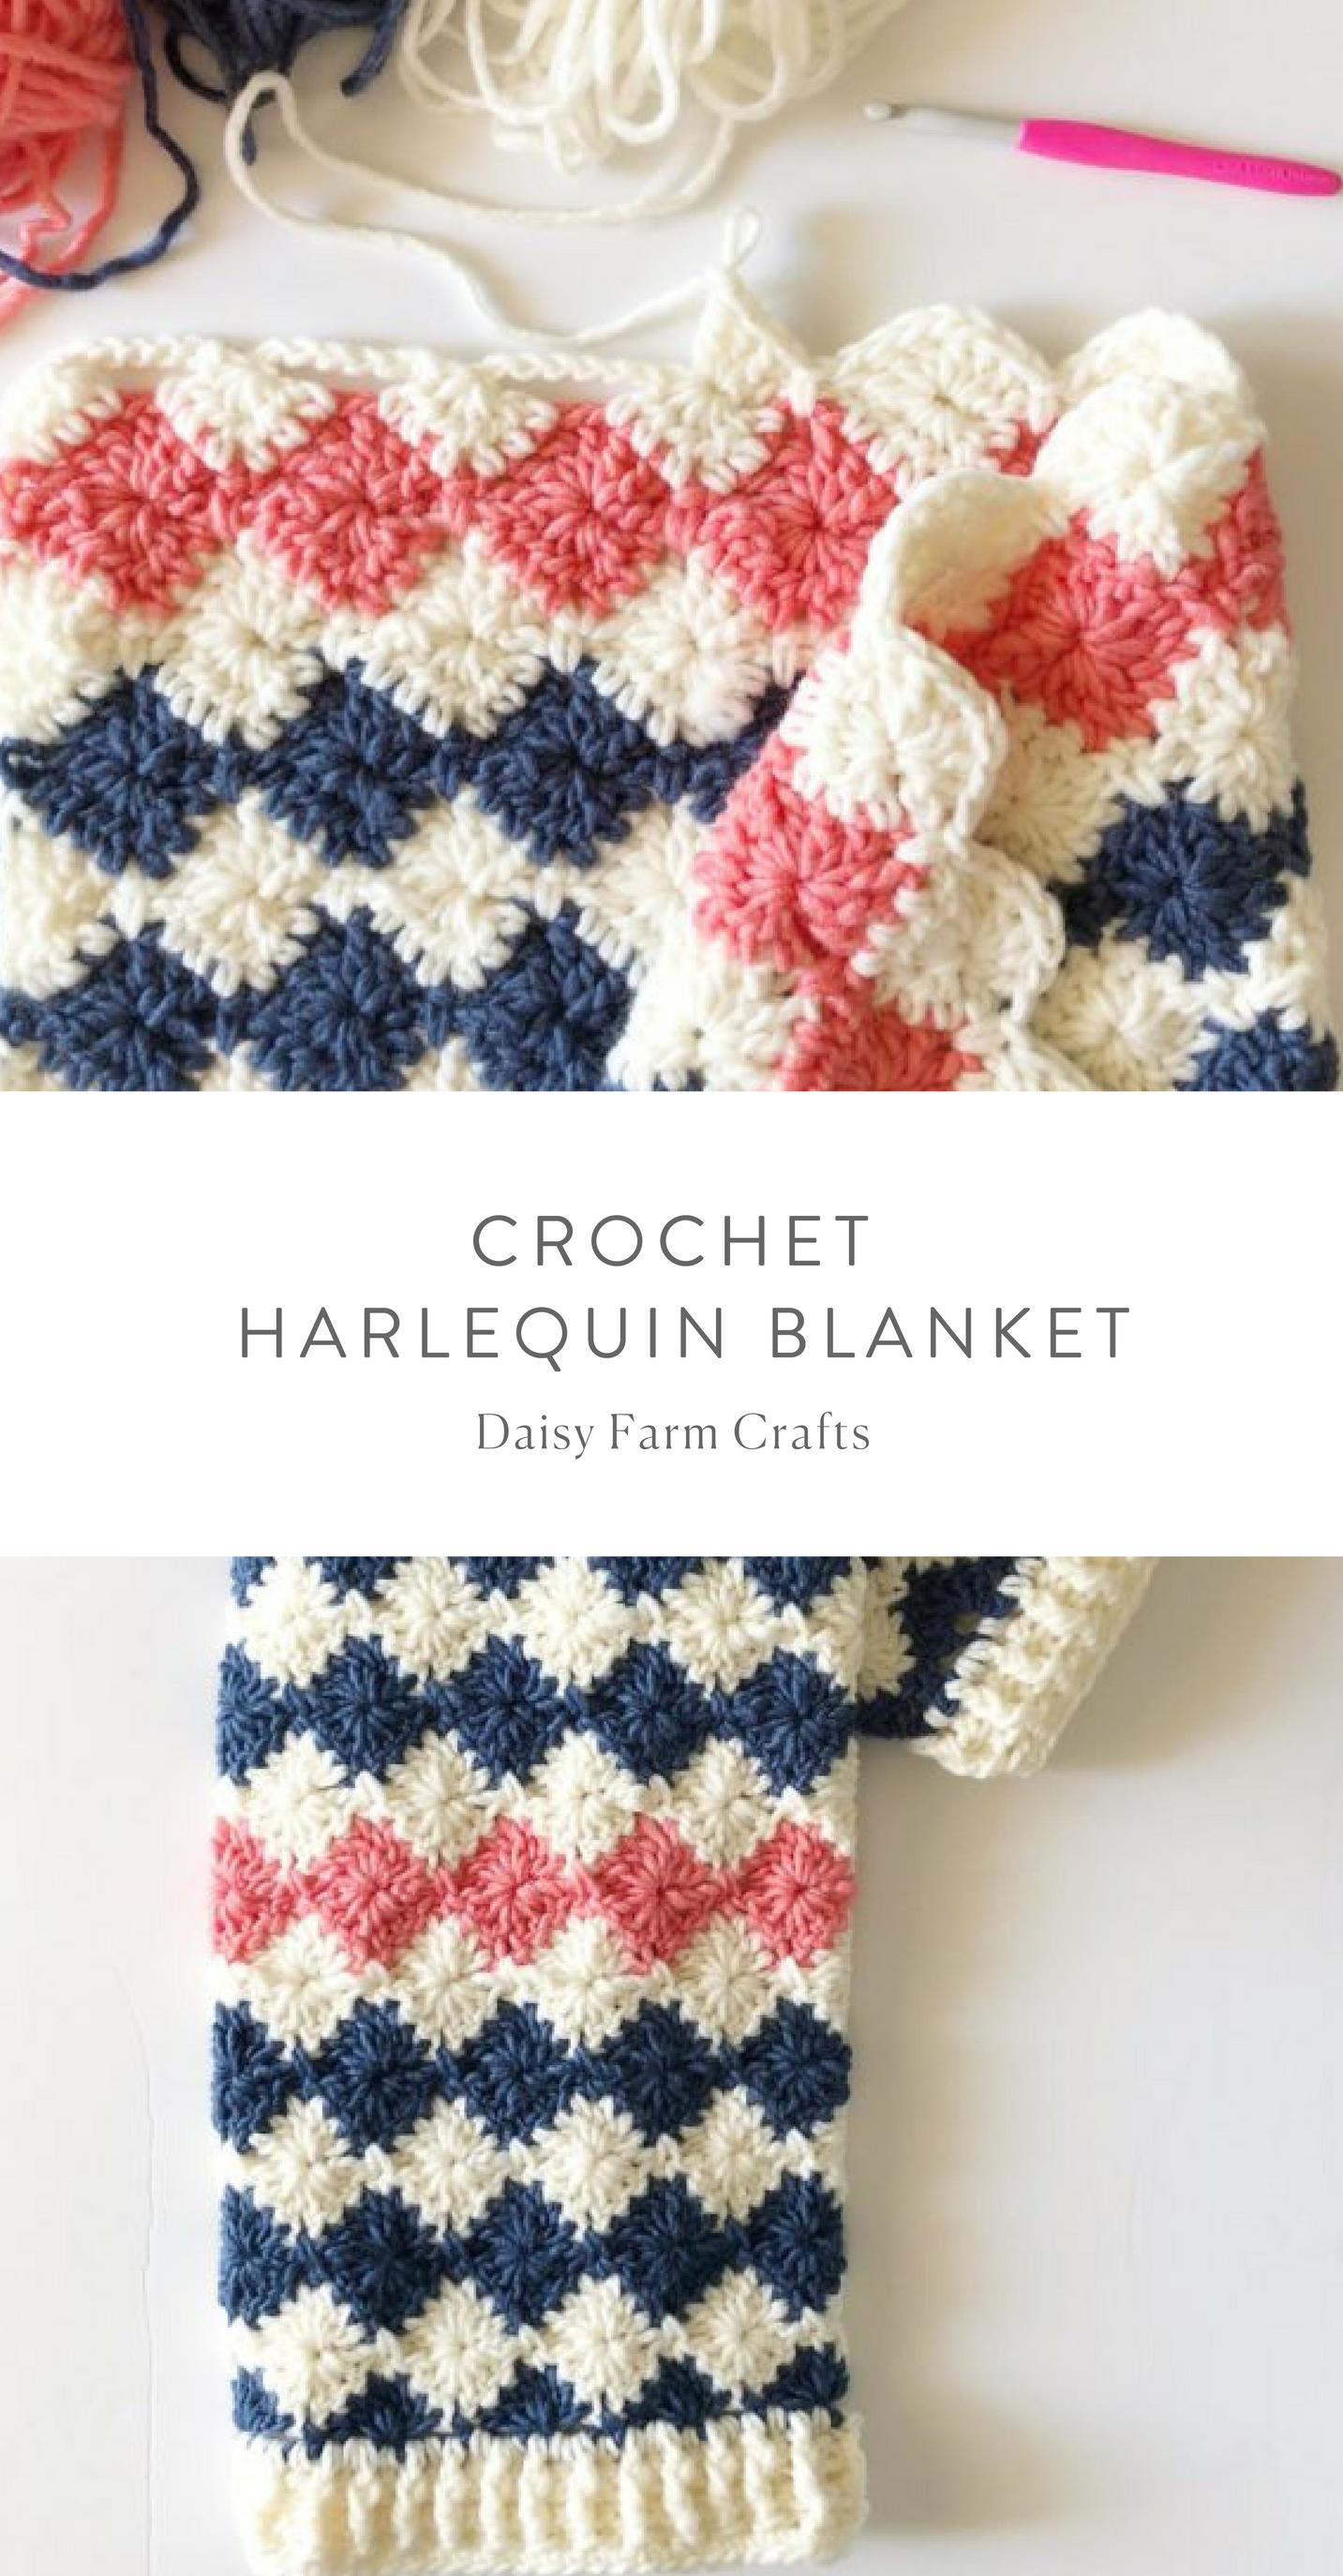 Free pattern - Crochet Harlequin Blanket #crochet | My Crochet ...